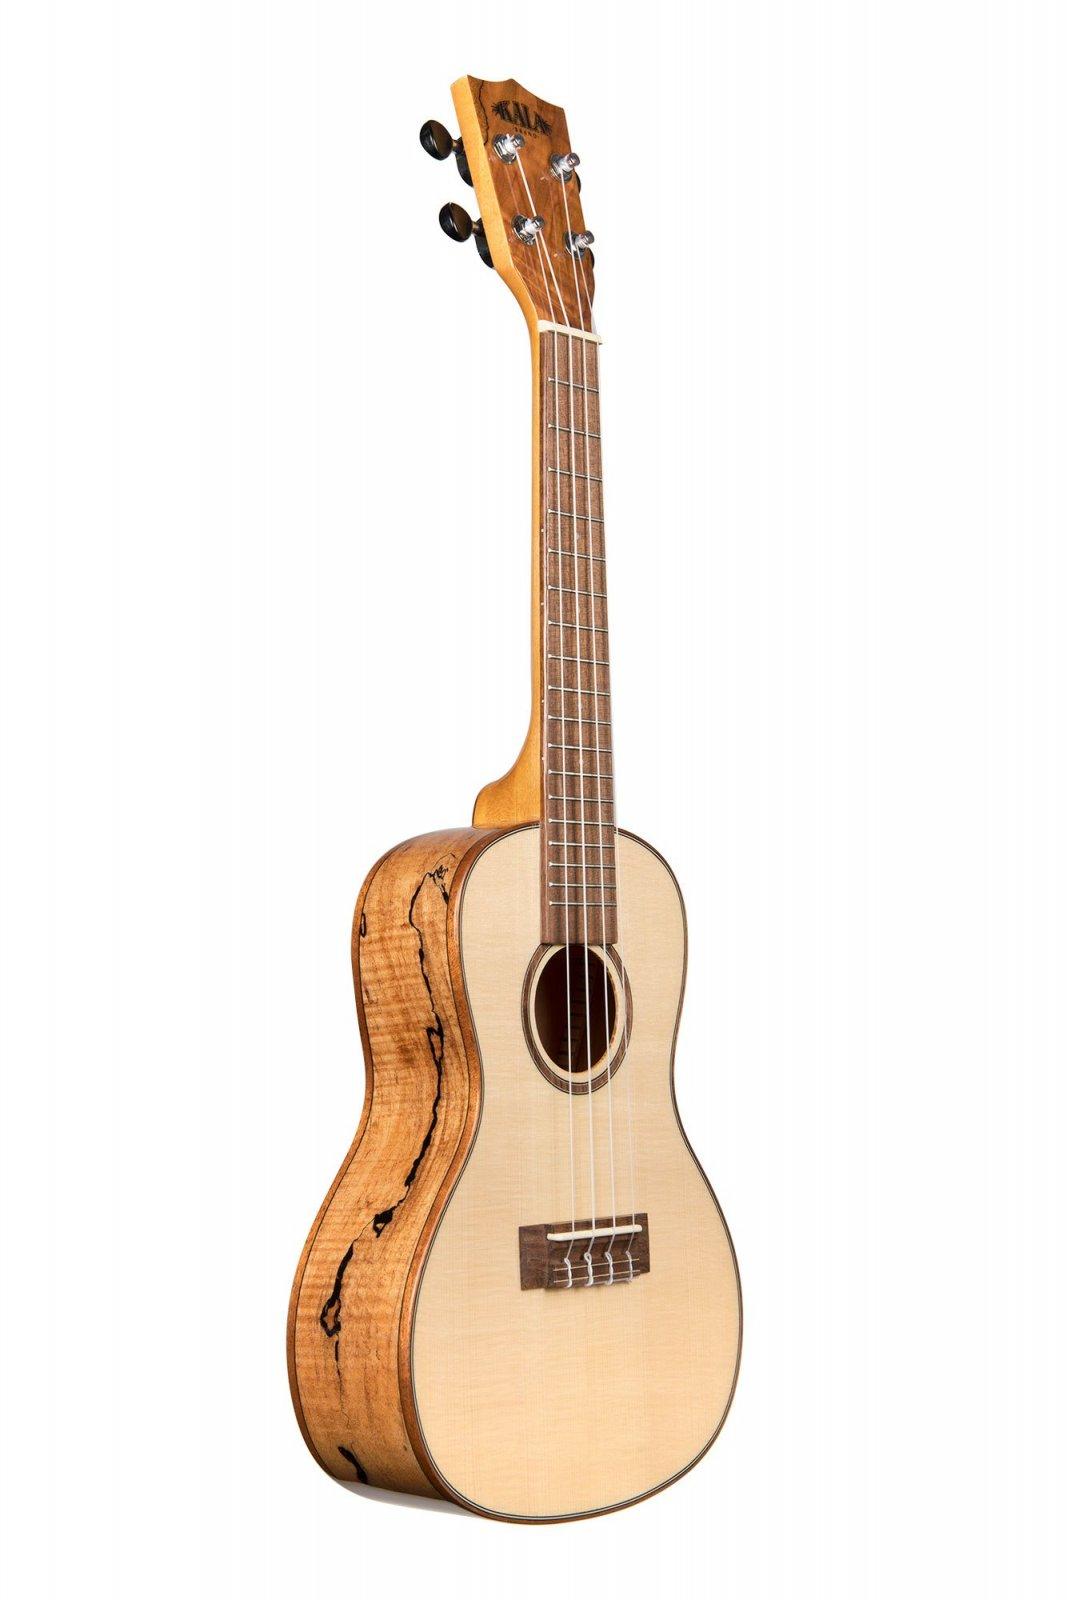 Kala KA-FMCG Concert Solid Spruce/Flame Maple